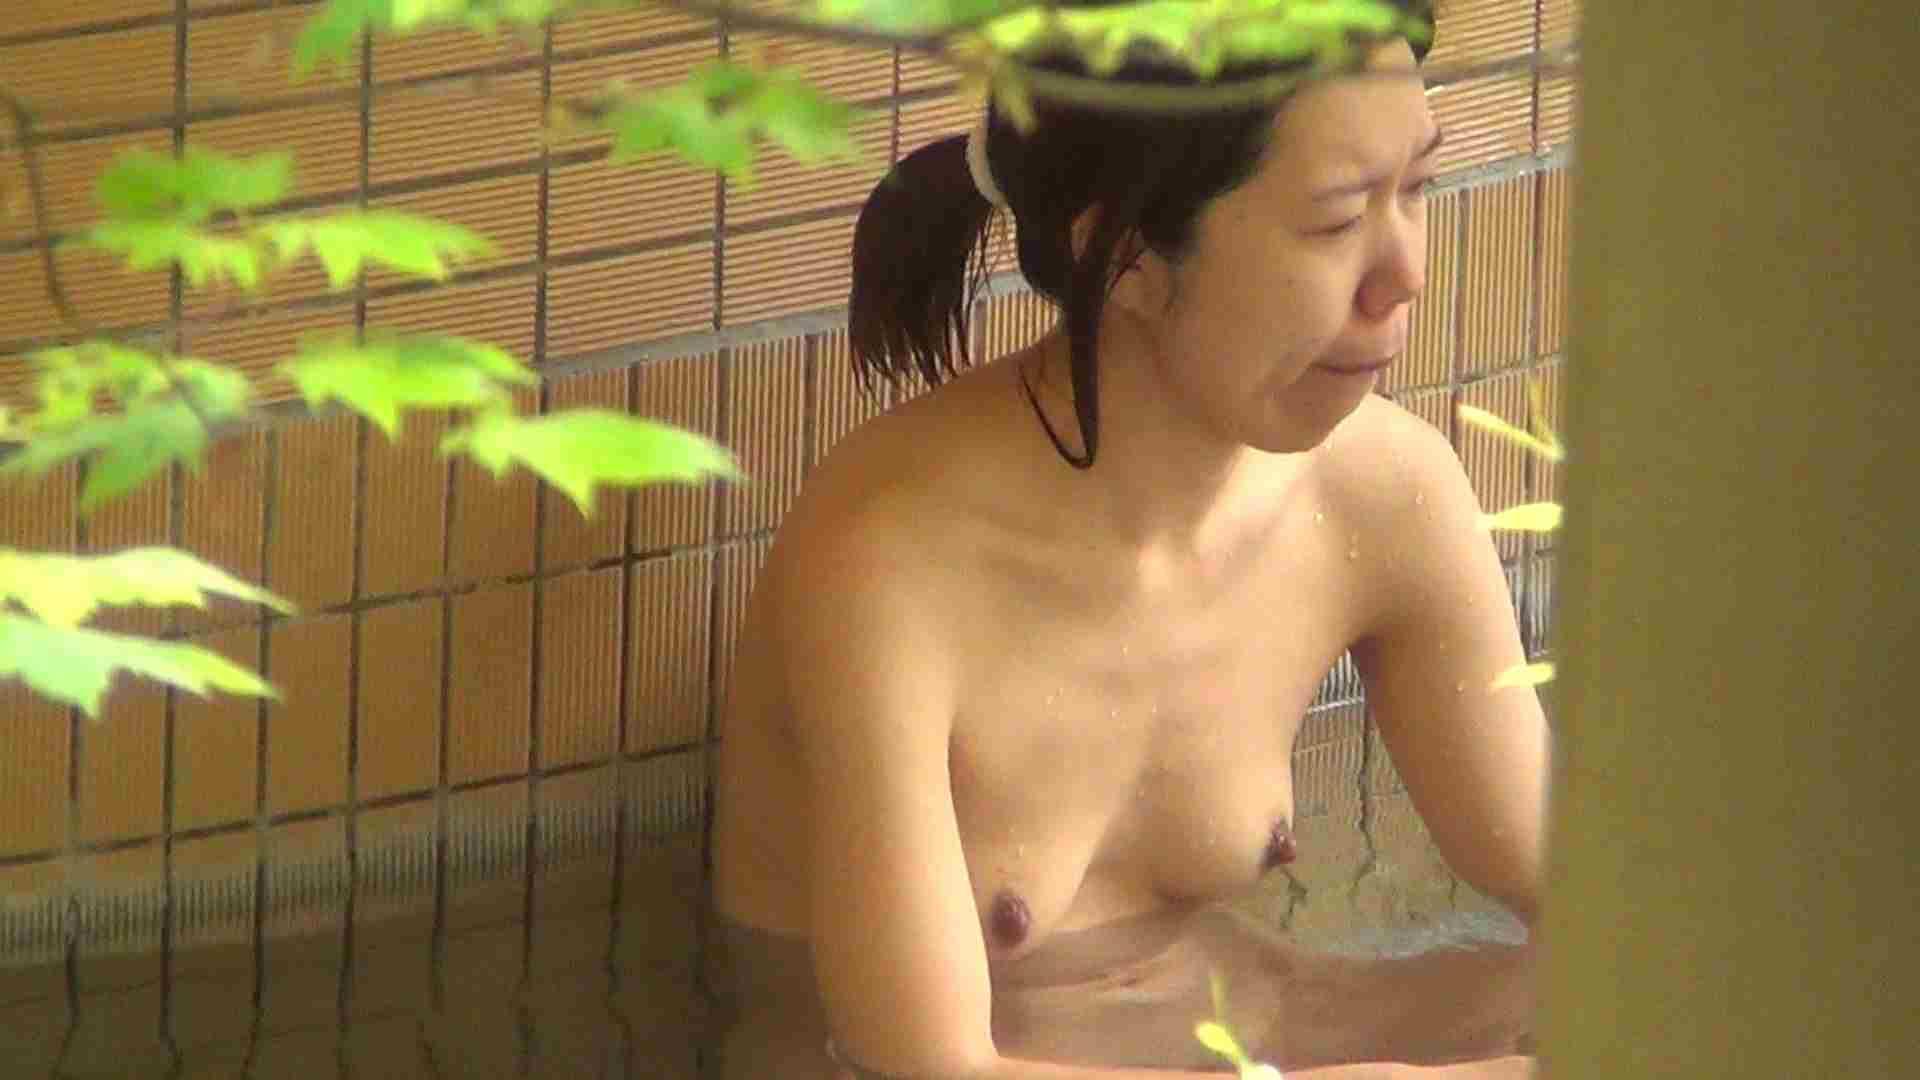 Aquaな露天風呂Vol.247 盗撮  83連発 24